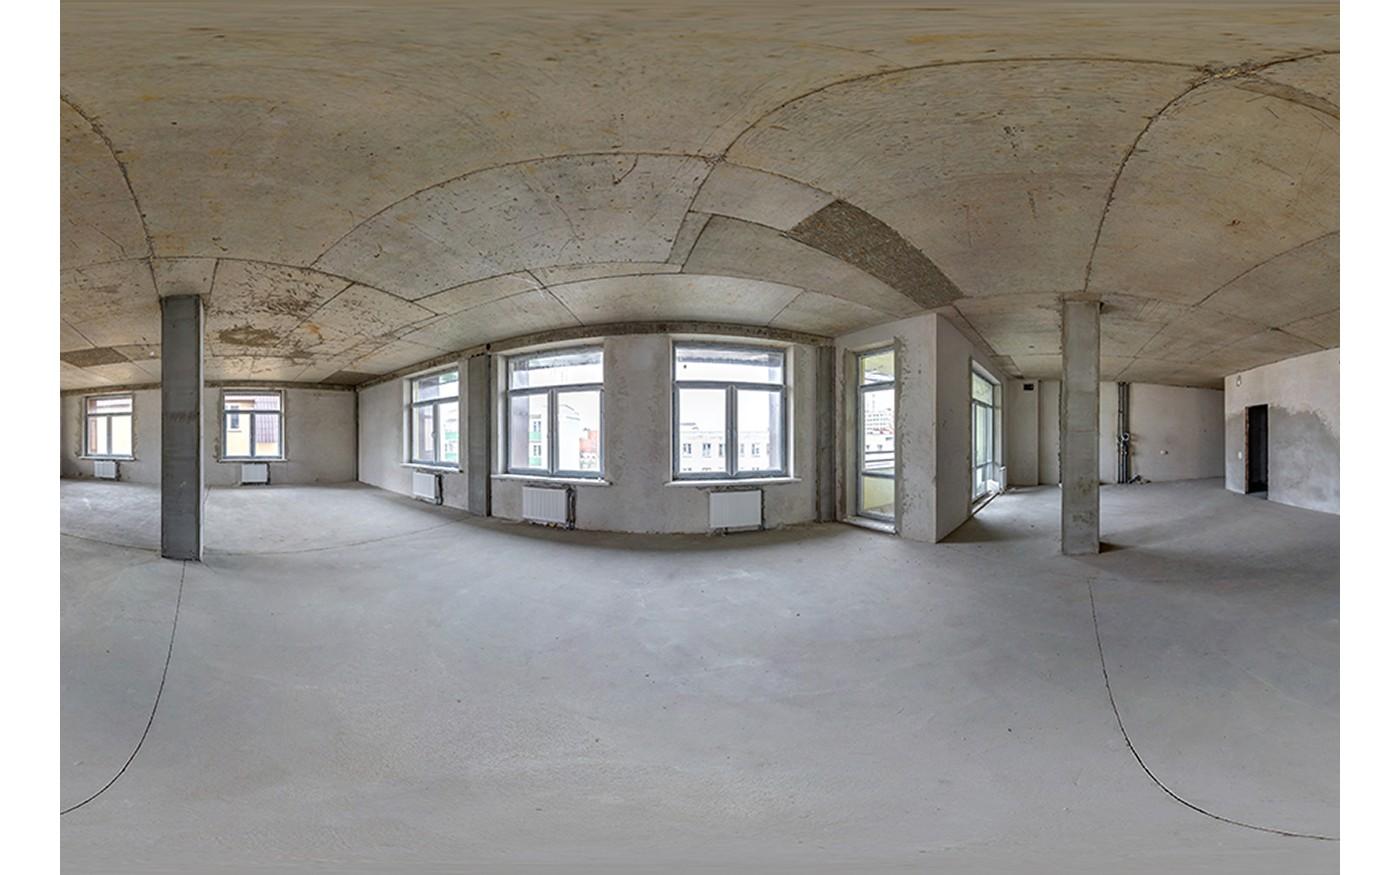 Fußboden aus Beton